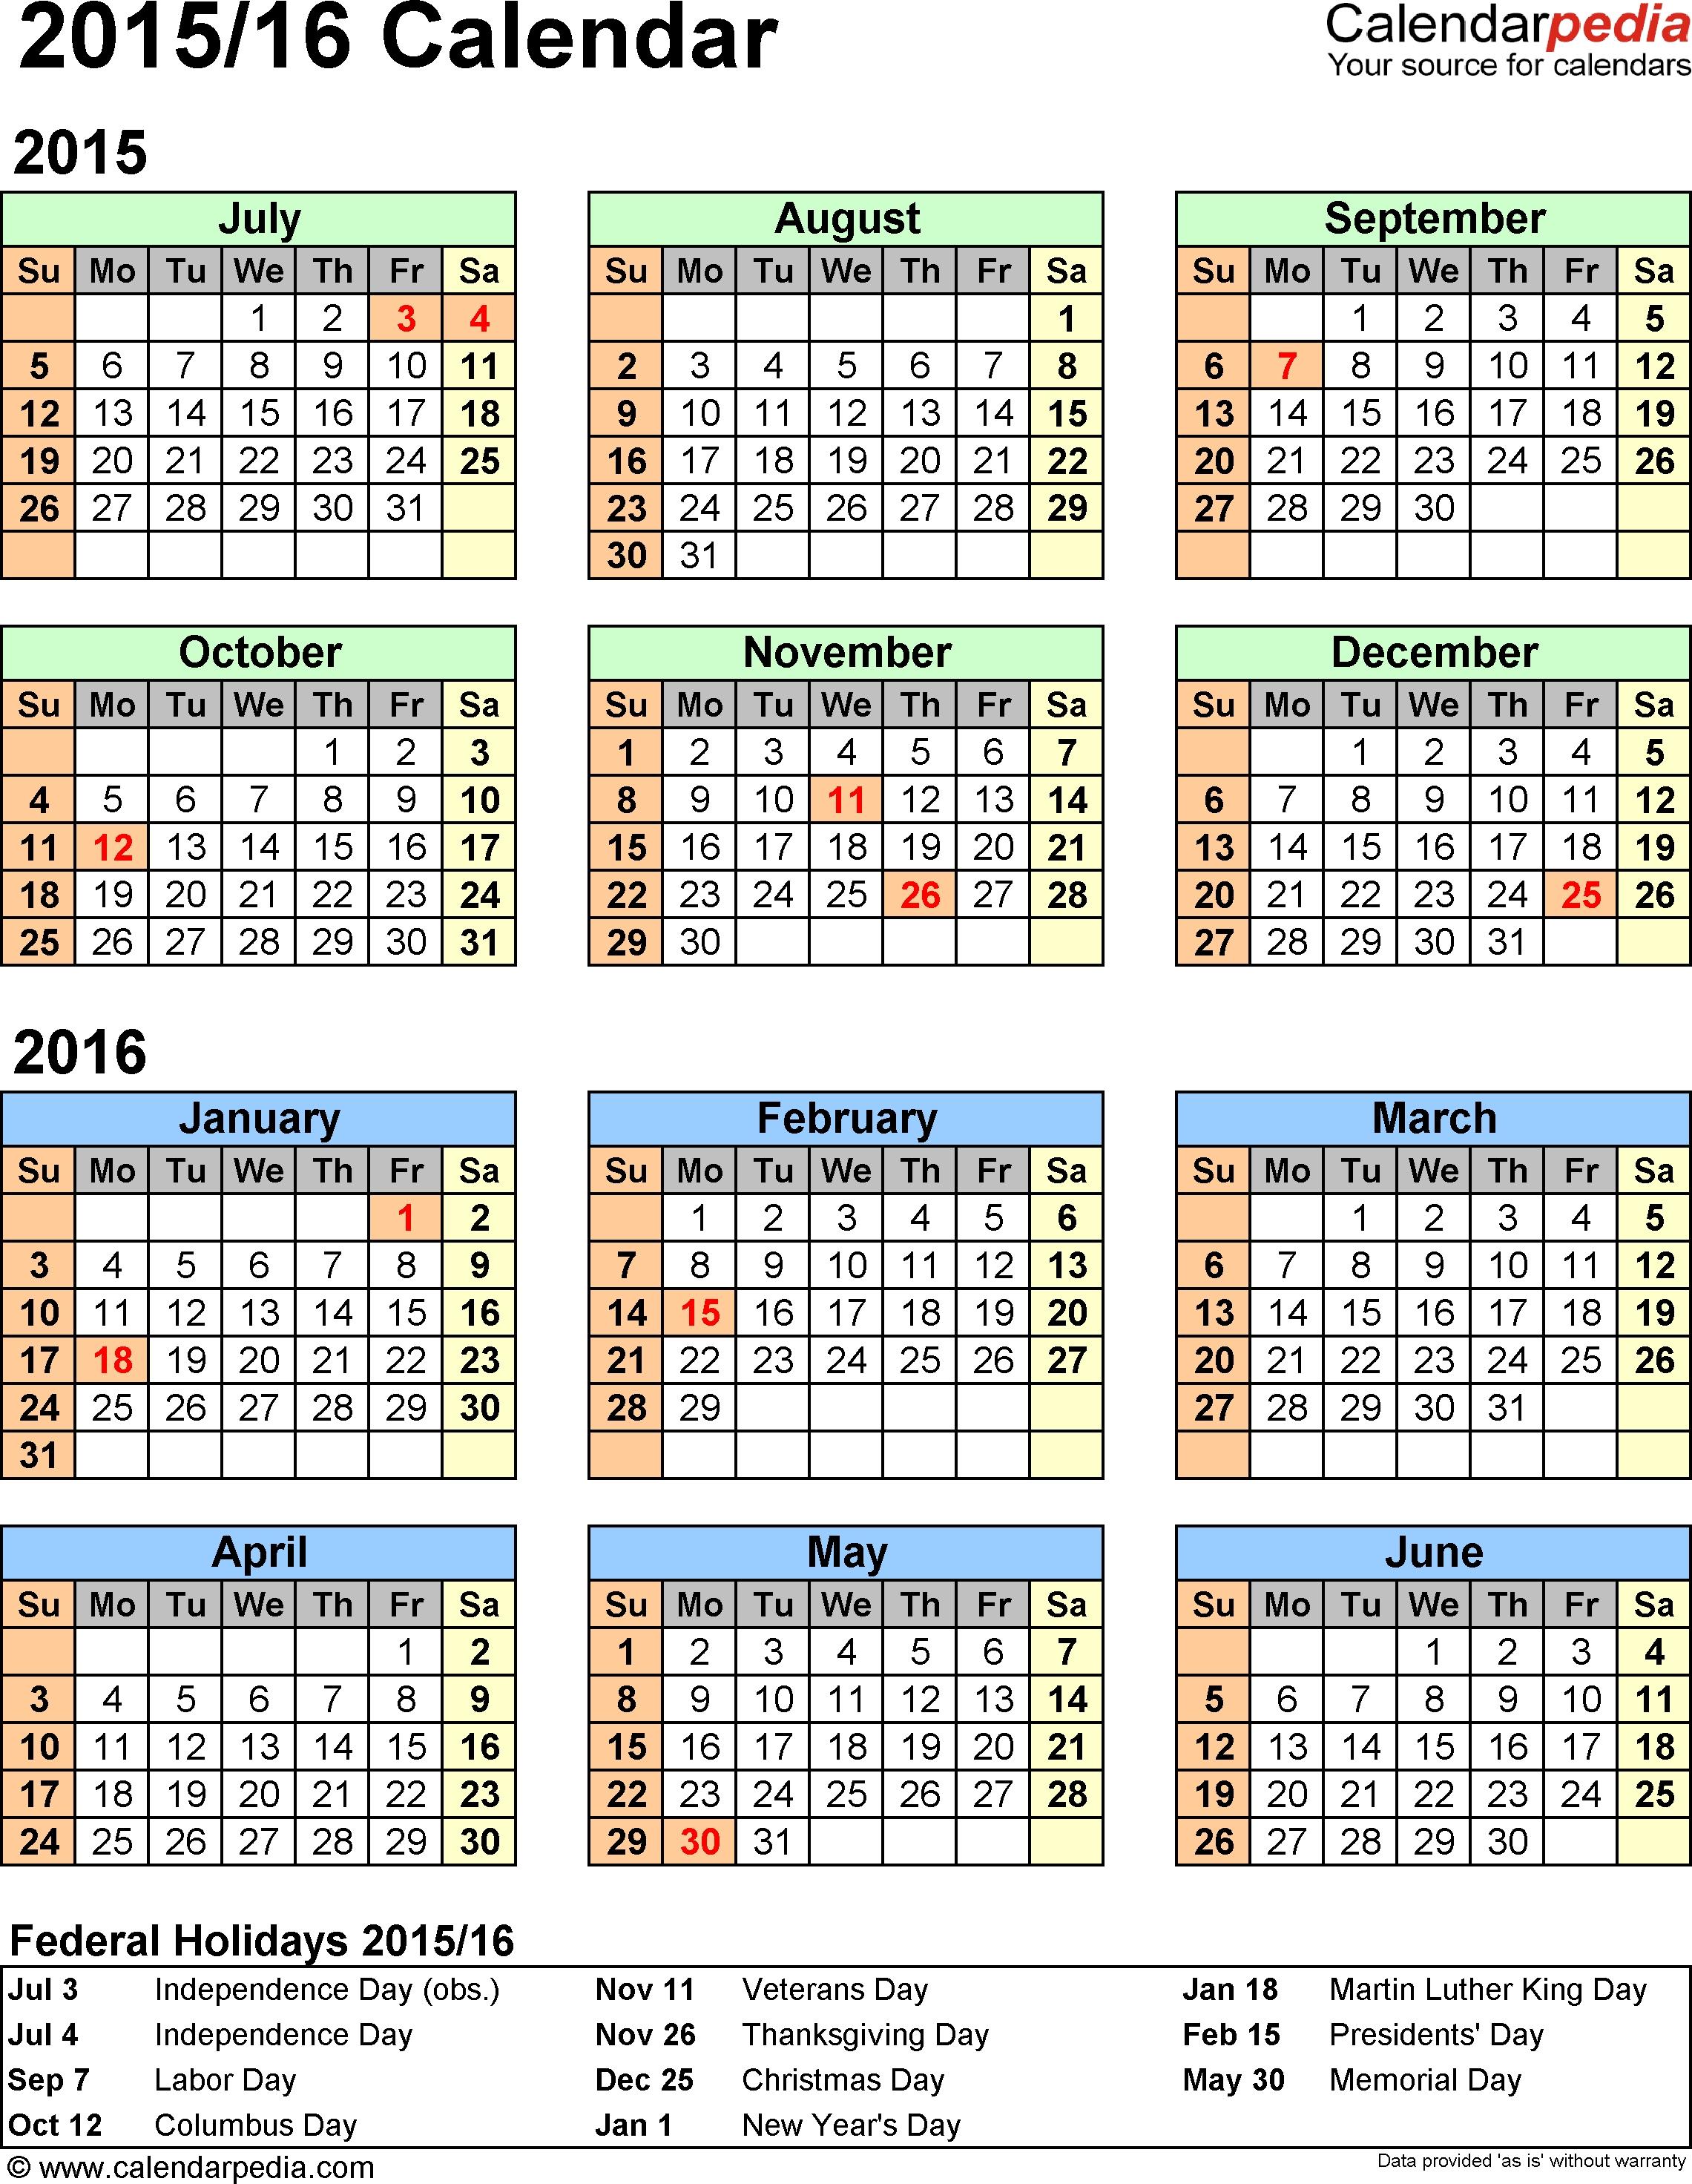 Split Year Calendar 2015/16 (July To June) - Pdf Templates  Financial Calendar Australia